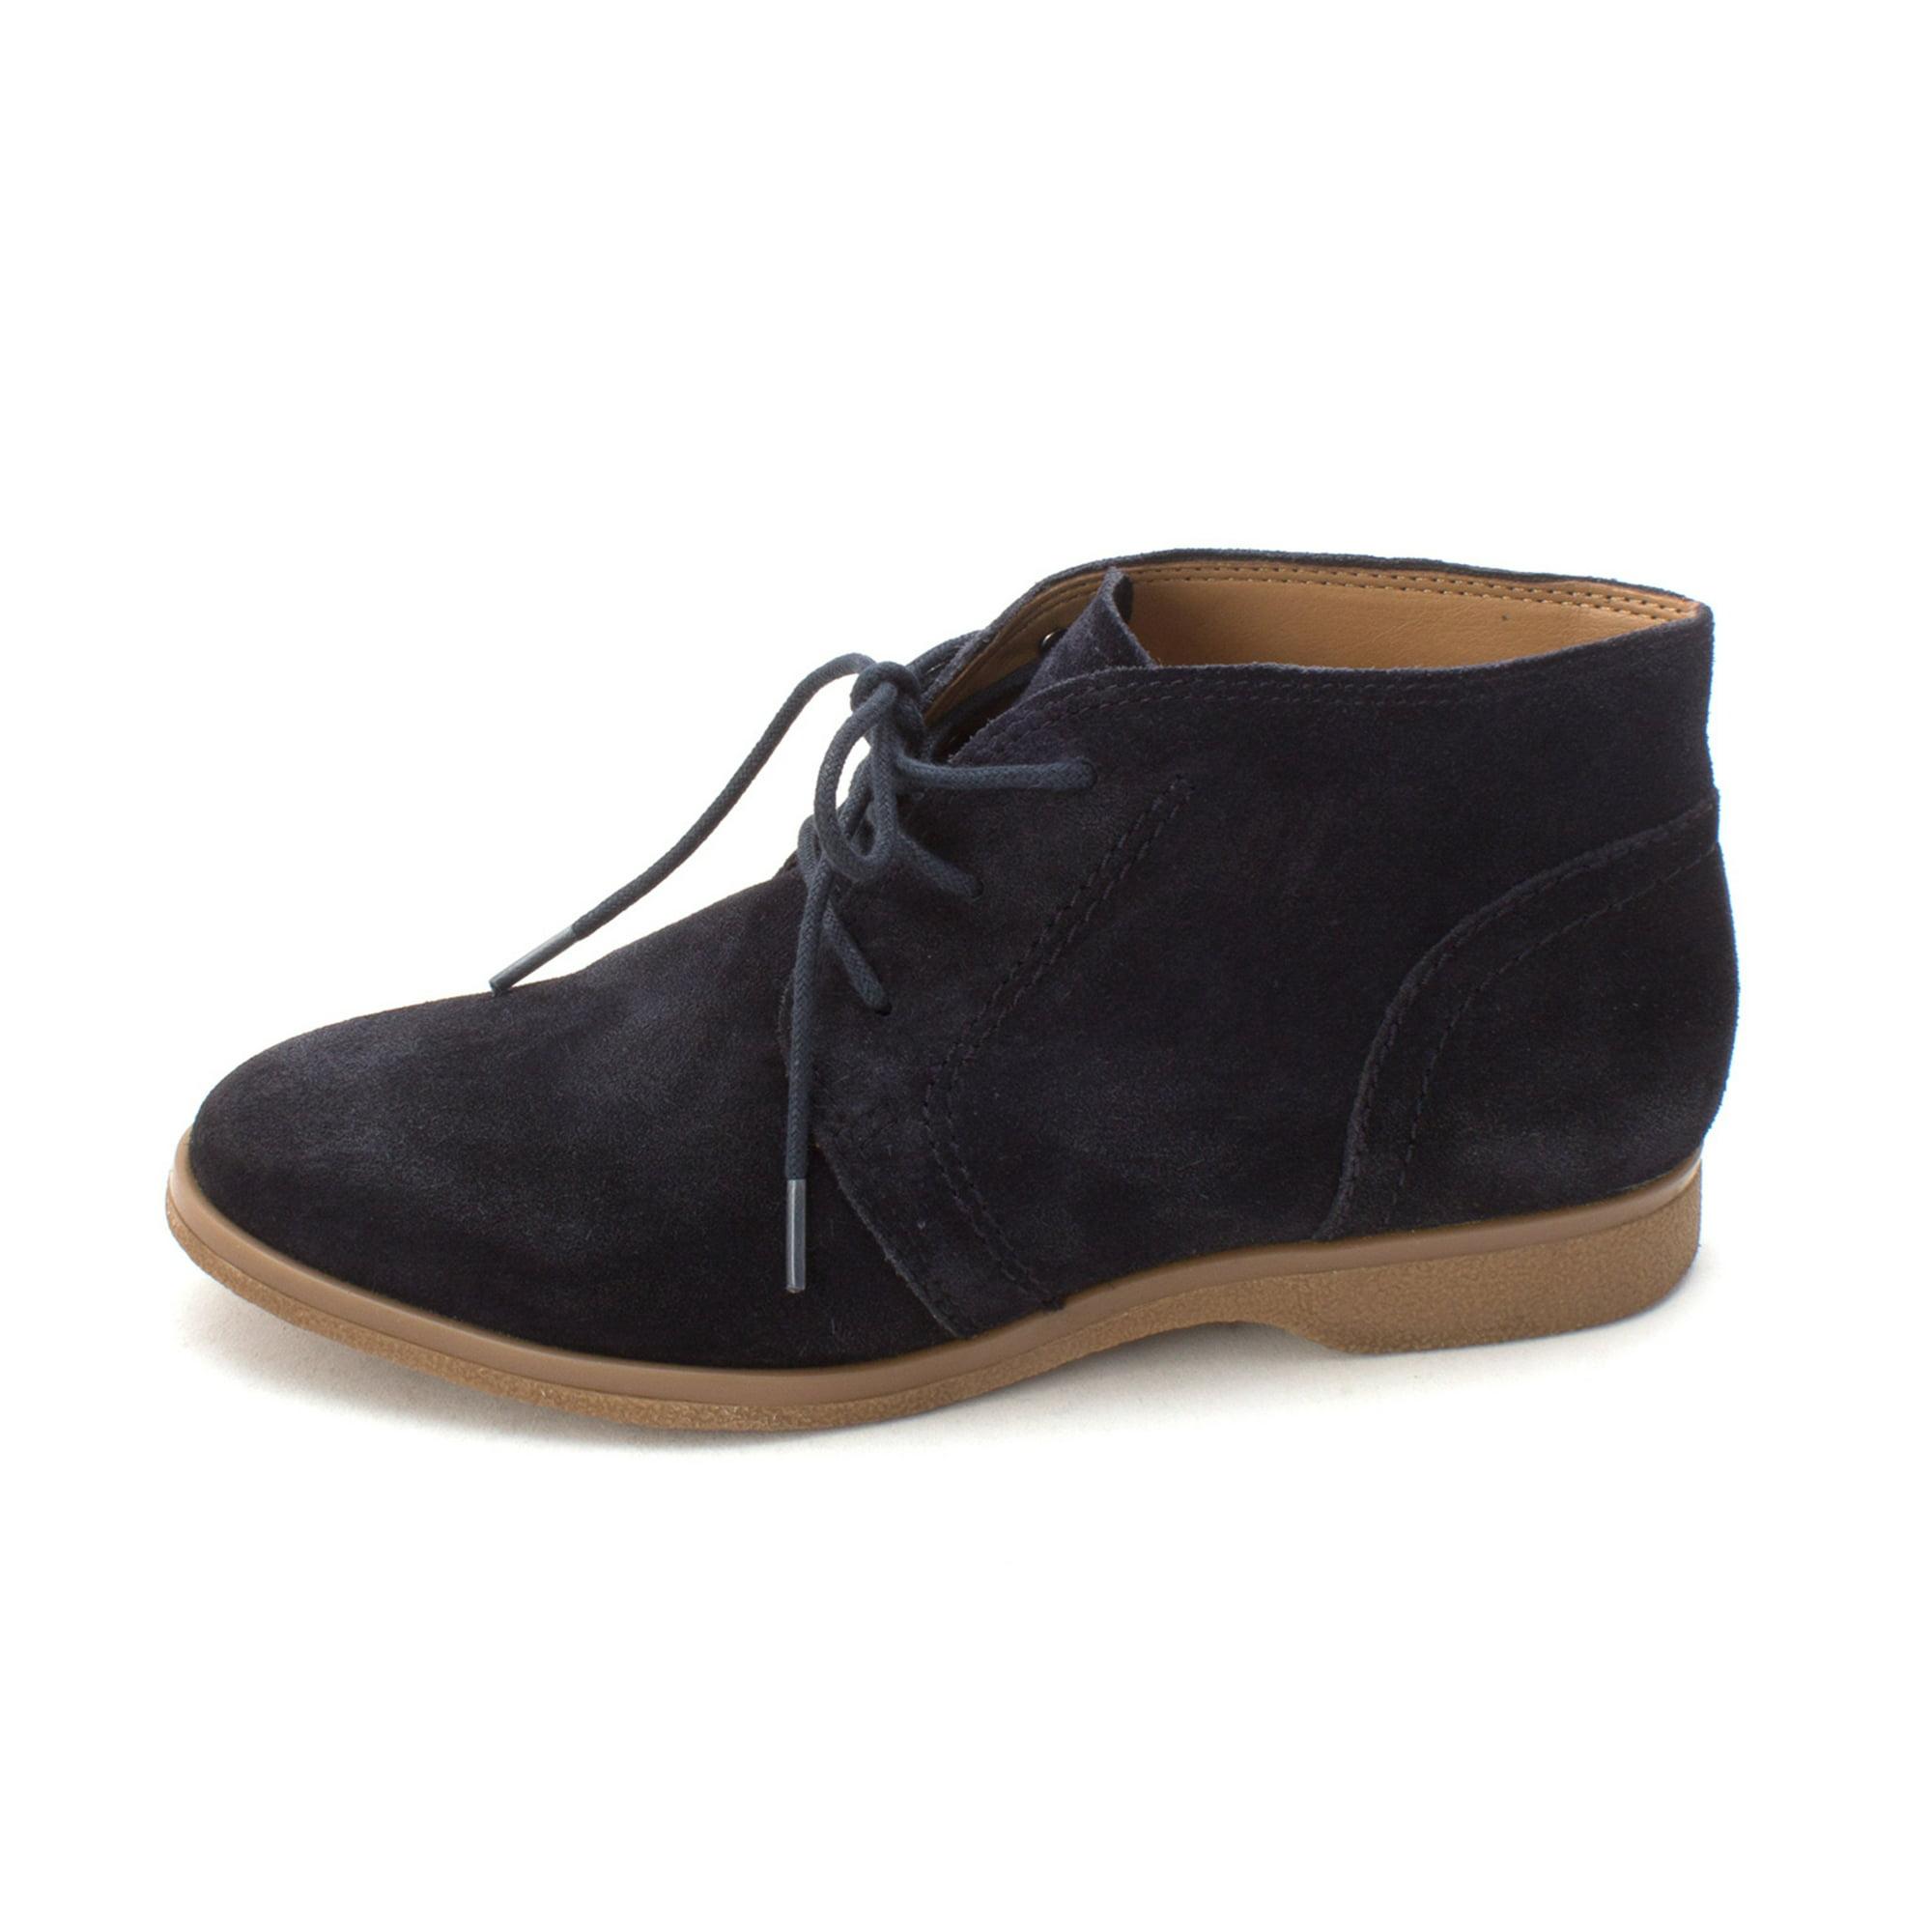 ac69486928 Franco Sarto Womens pebbles Closed Toe Ankle Fashion Boots